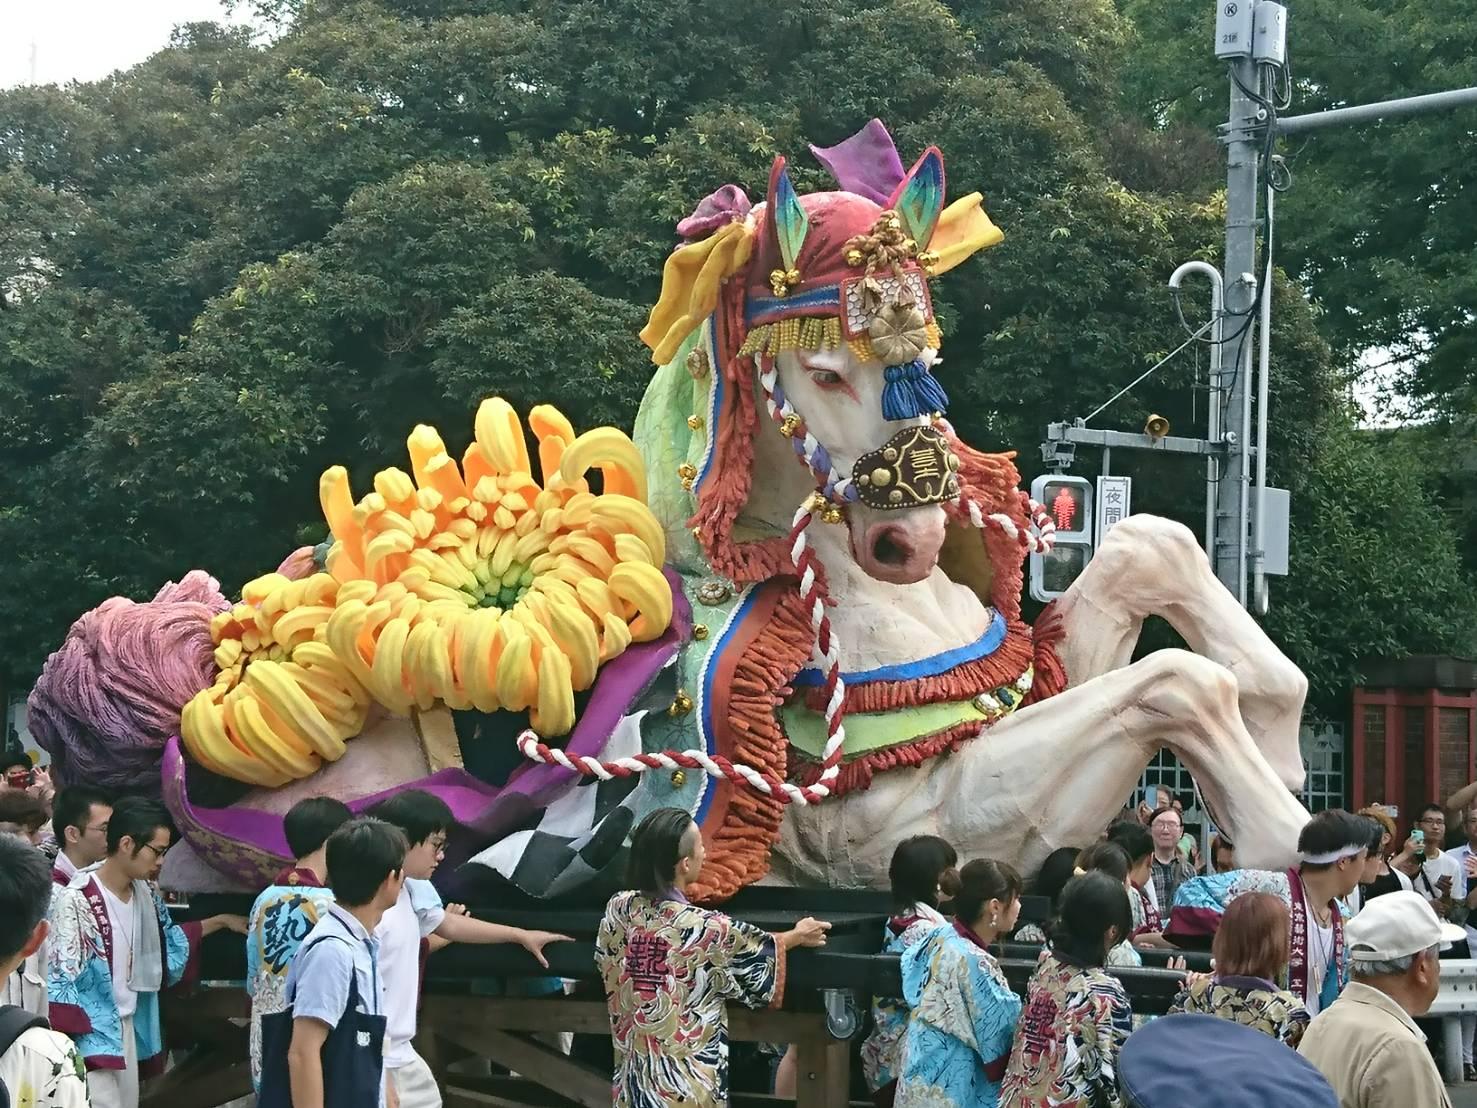 東京藝術大学の学祭、今年もヤバイ #東京藝術大学学祭